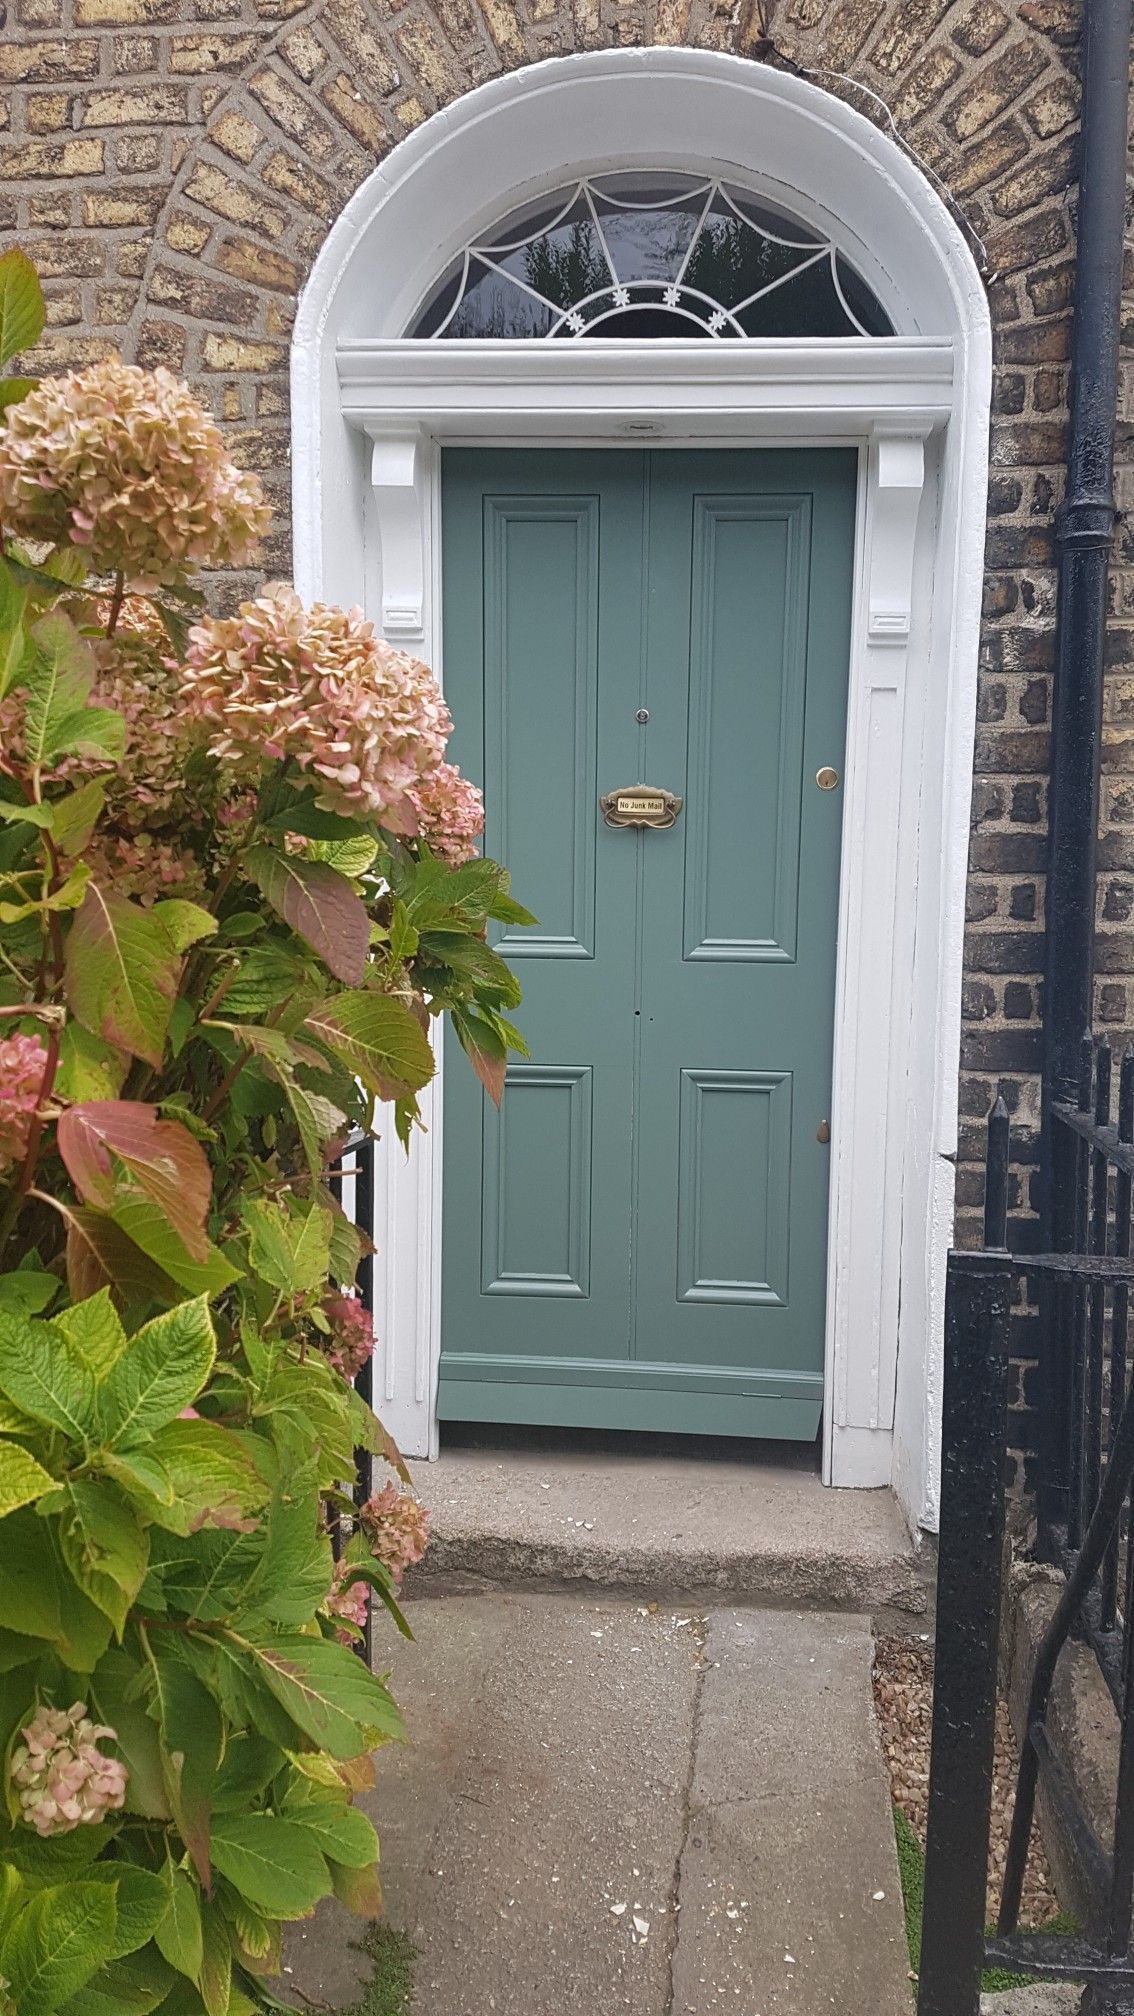 Farrow And Ball Green Smoke Exterior Eggshell Period House Door Frame All White Hydrangeas Brick Painted Front Doors Green Front Doors Front Door Styles